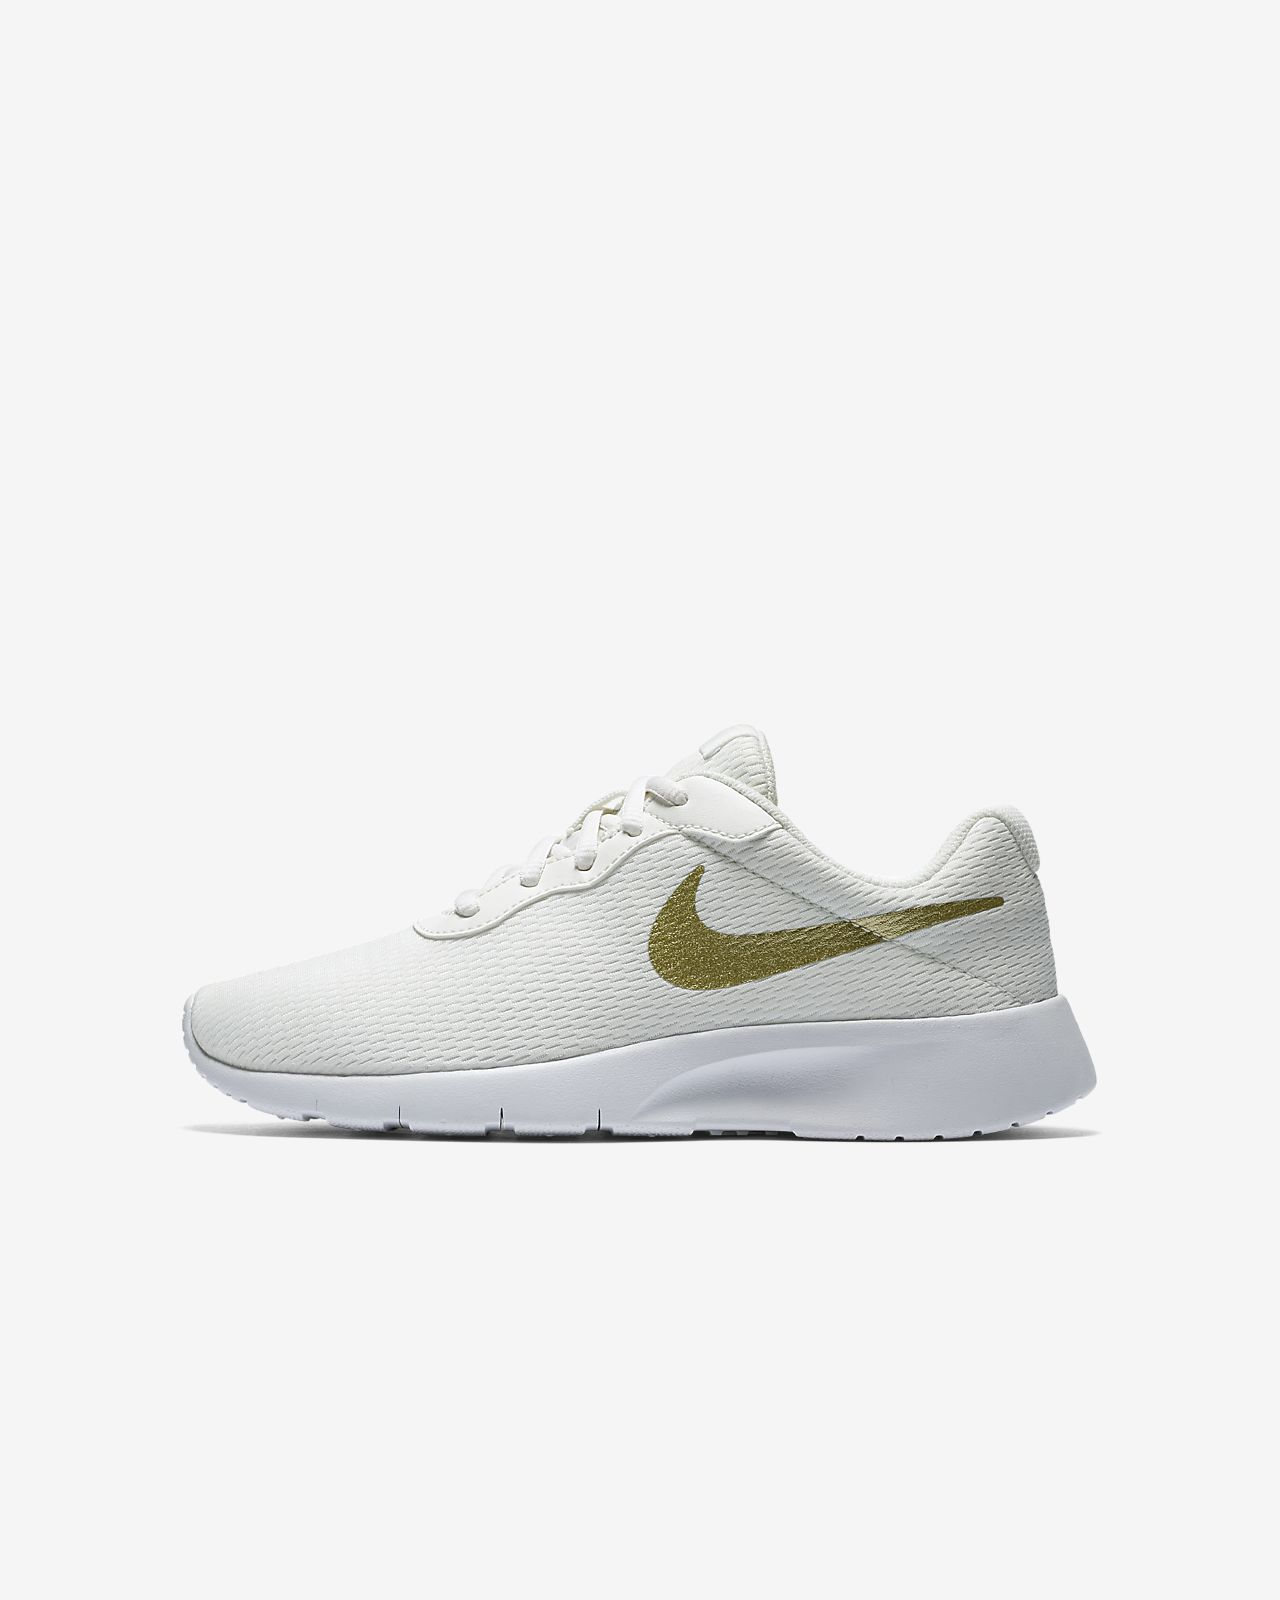 Nike AIR FORCE 1 GRADE SCHOOL White Gold Kids Shoes S04DDBR7N